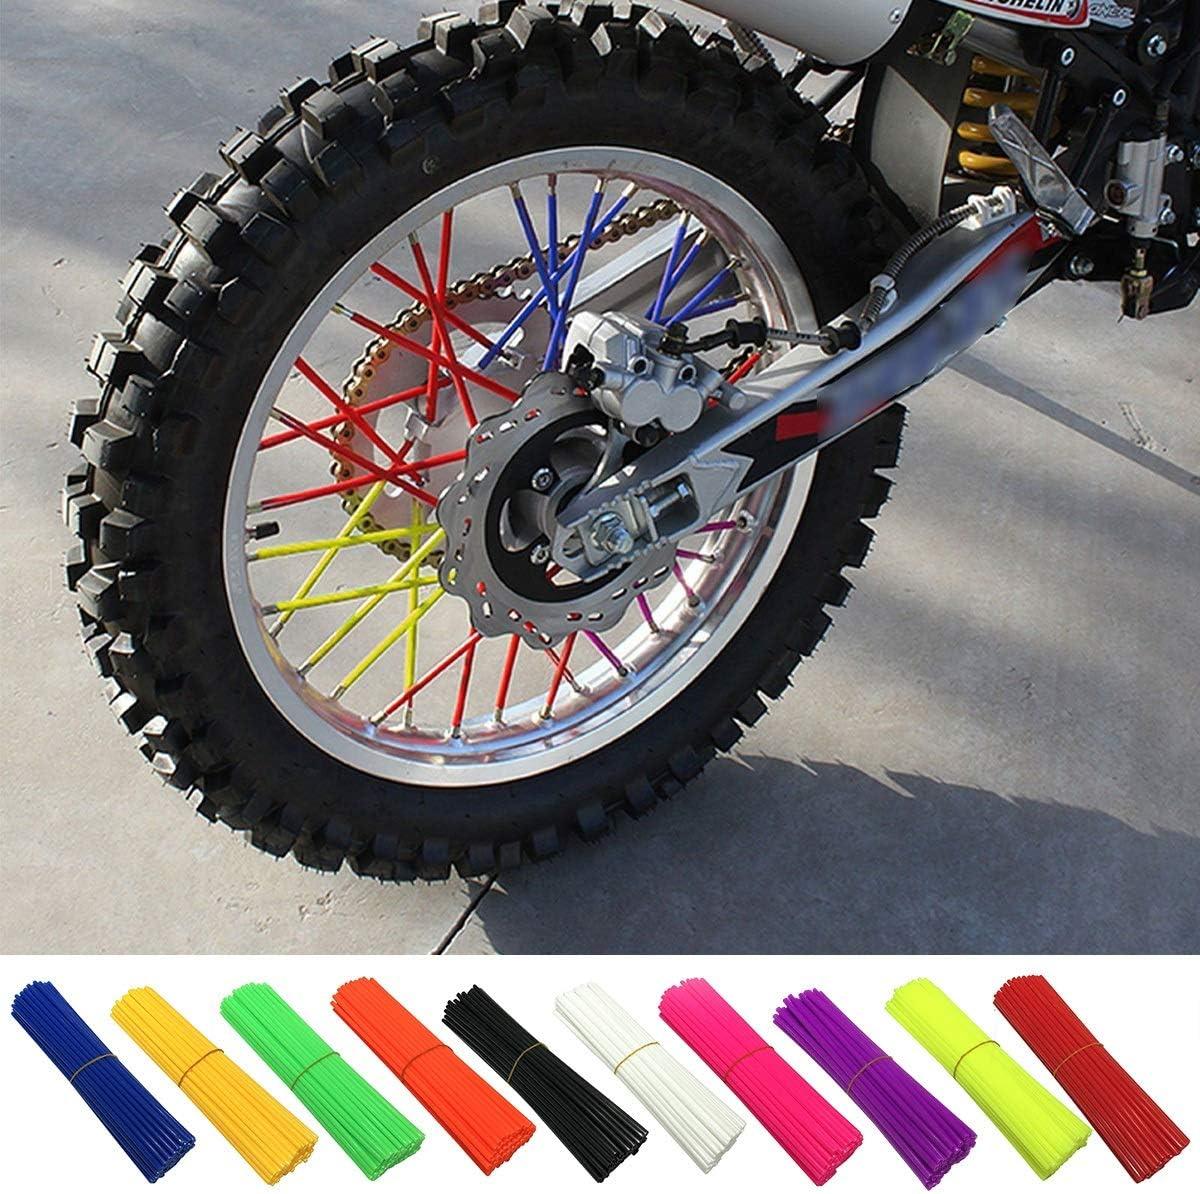 72pcs//lot Spoke Skins Covers,ECLEAR Universal Motocross Dirt Bike MX Enduro Off Road Wheel Rim Spoke Wraps Shrouds Skins Covers Yellow